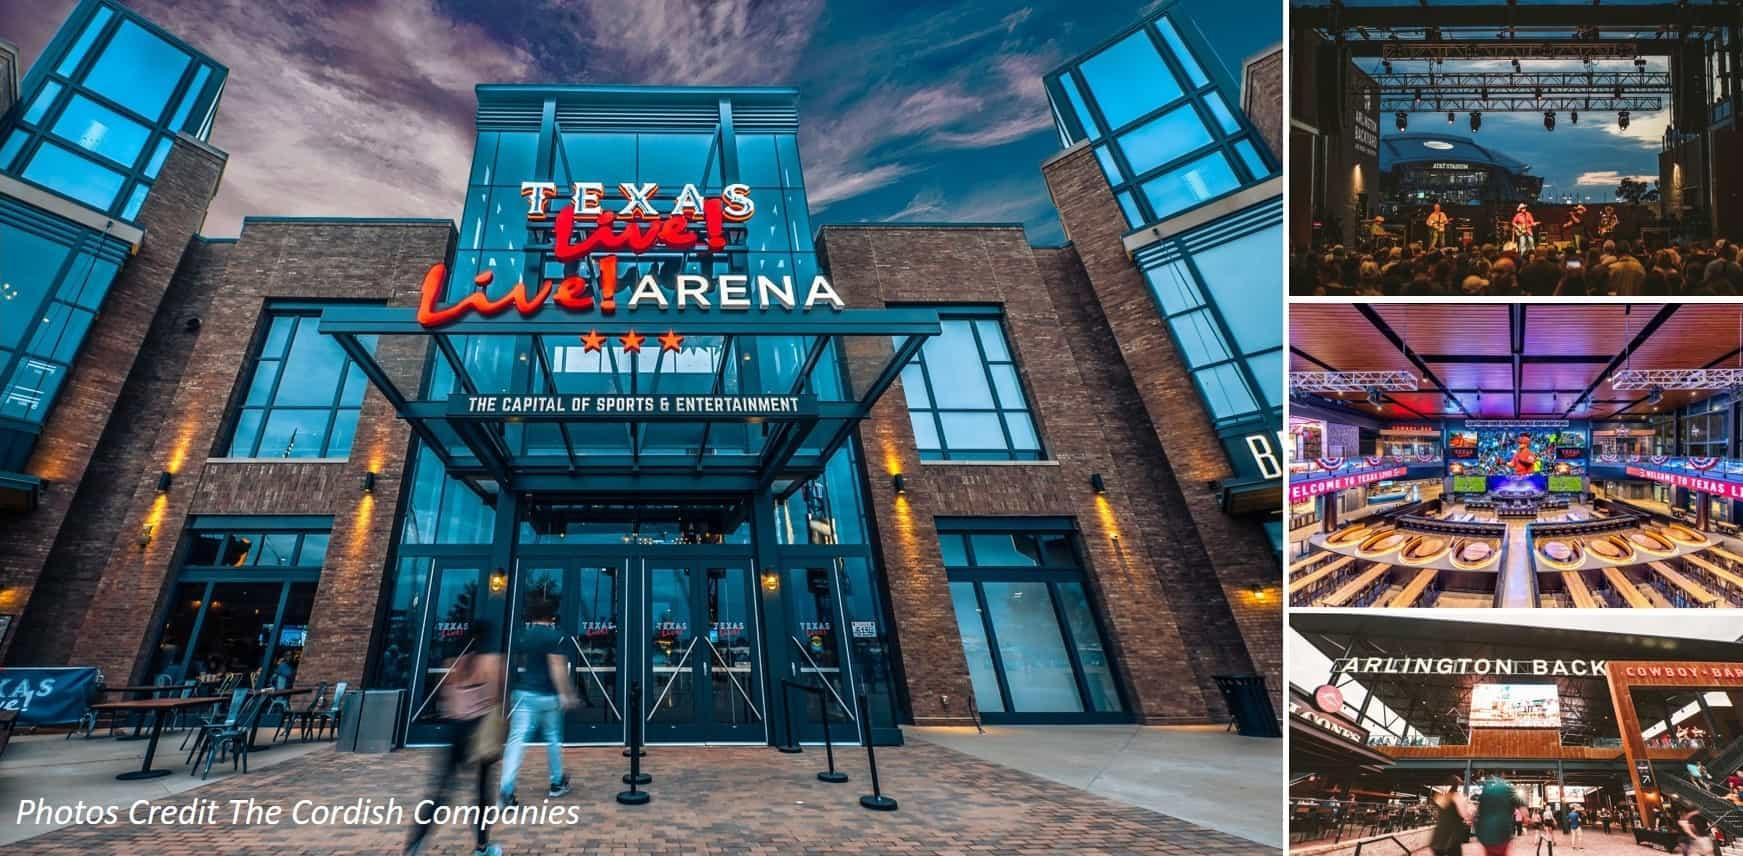 The Cordish companies' Texas Live!